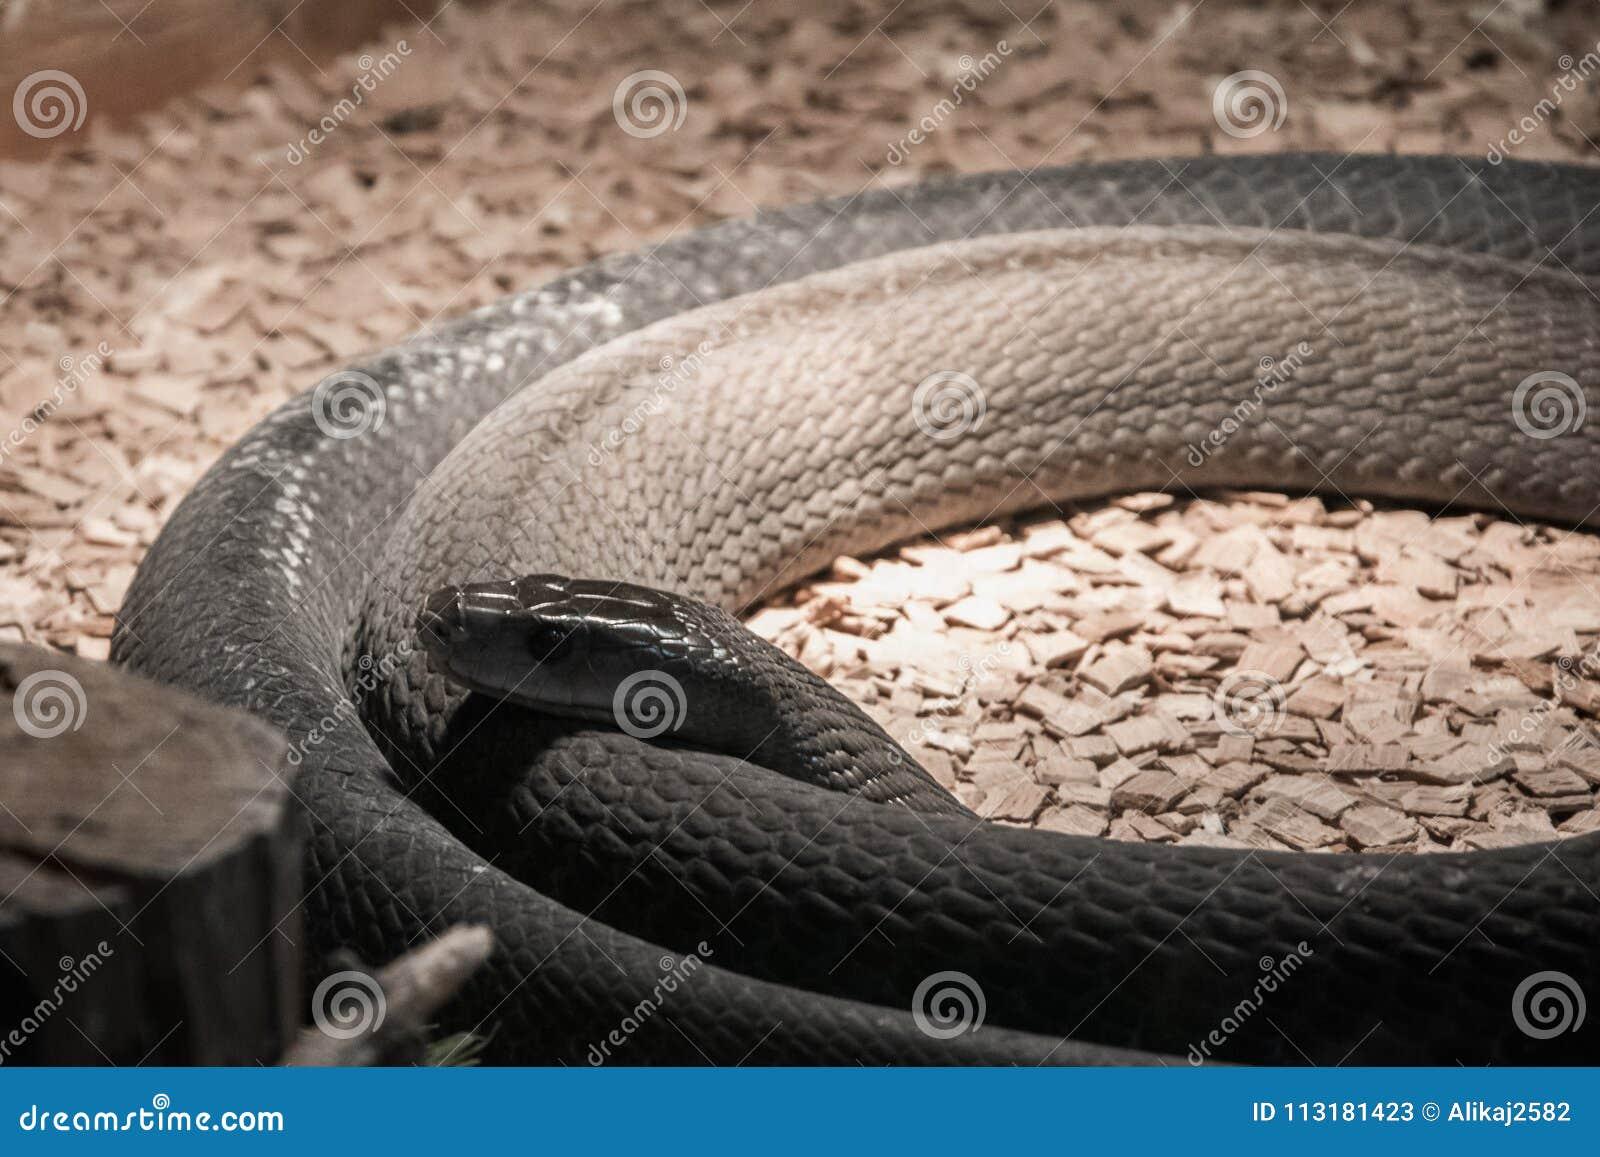 Highly Venomous Snake Black Mamba In Terrarium Stock Image Image